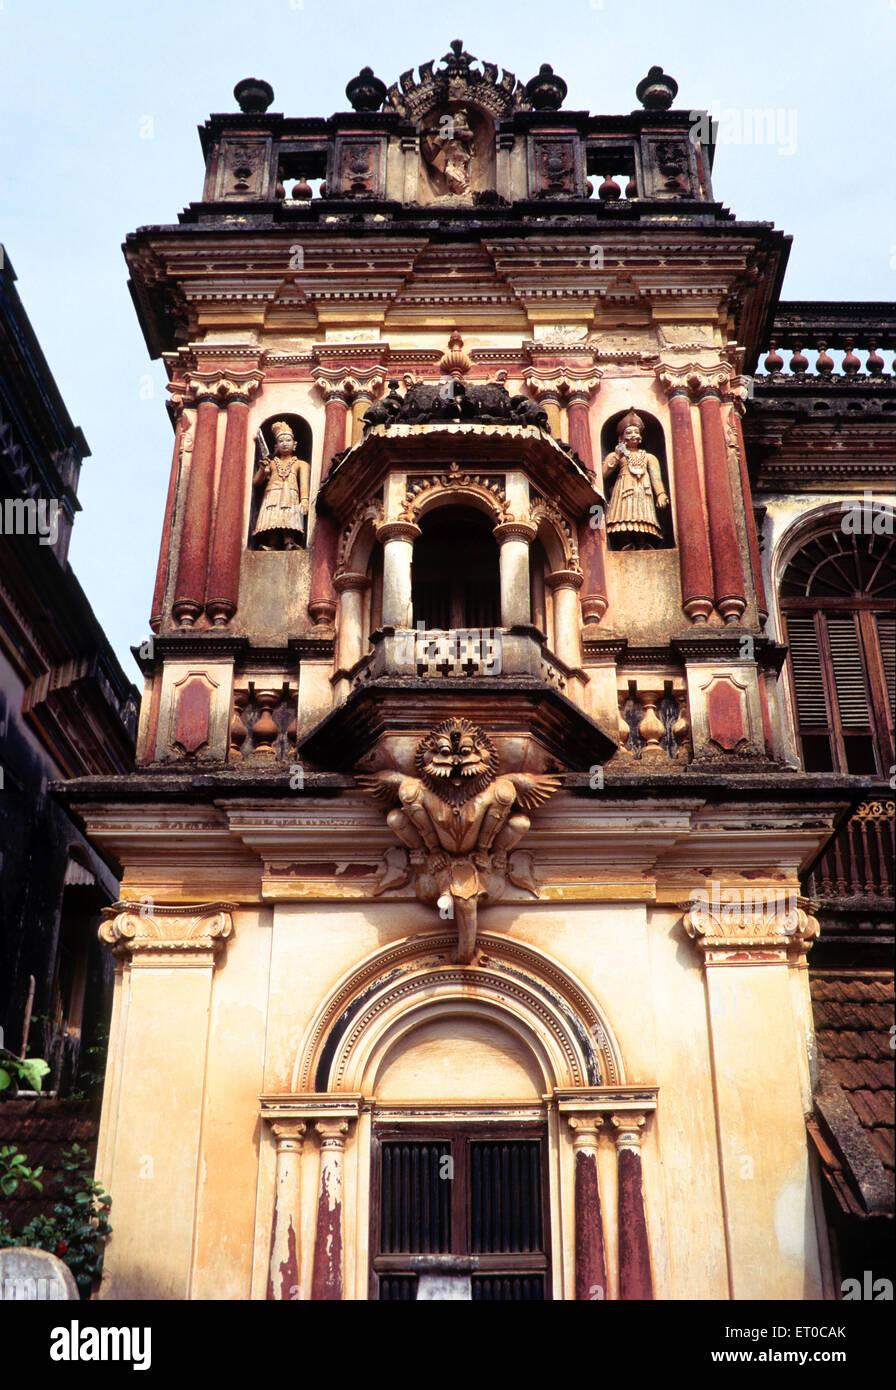 Statues carved on nattukottai chettiar or nagarathar house ; Chettinad ; Tamil Nadu ; India - Stock Image